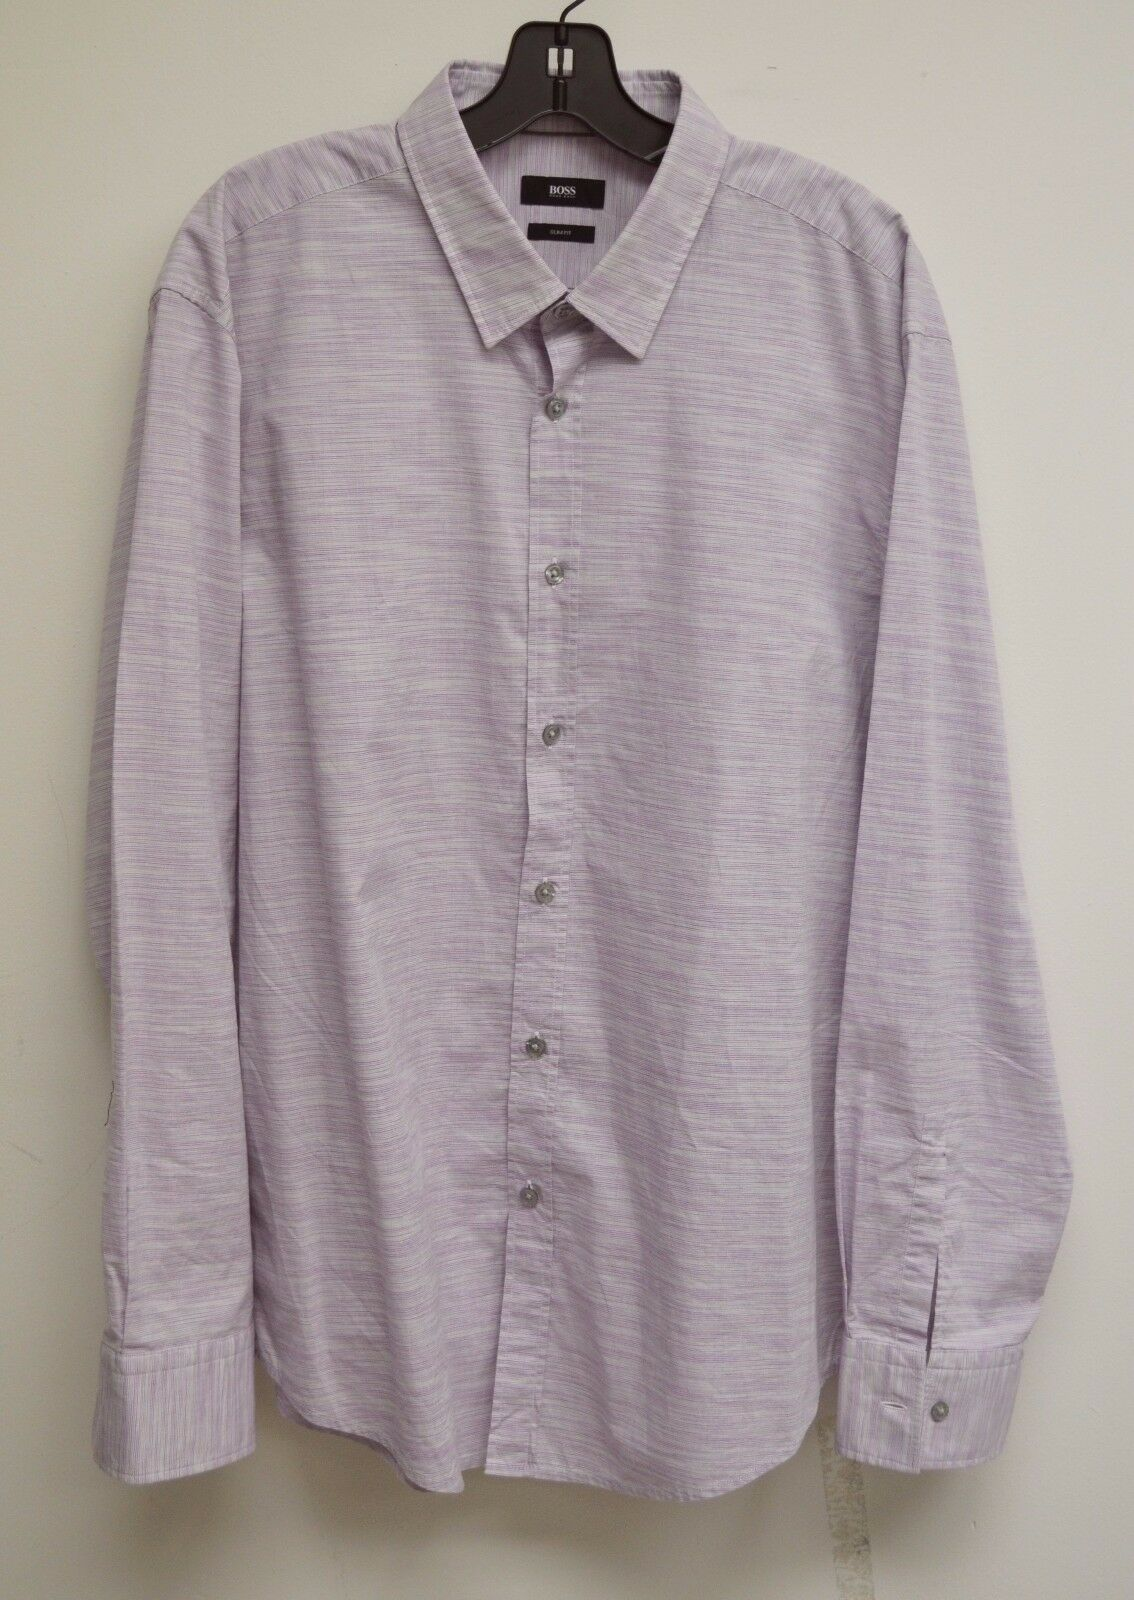 Hugo Boss Slim Fit Violet & grau Striped Cotton Button Front Dress Shirt 2XL